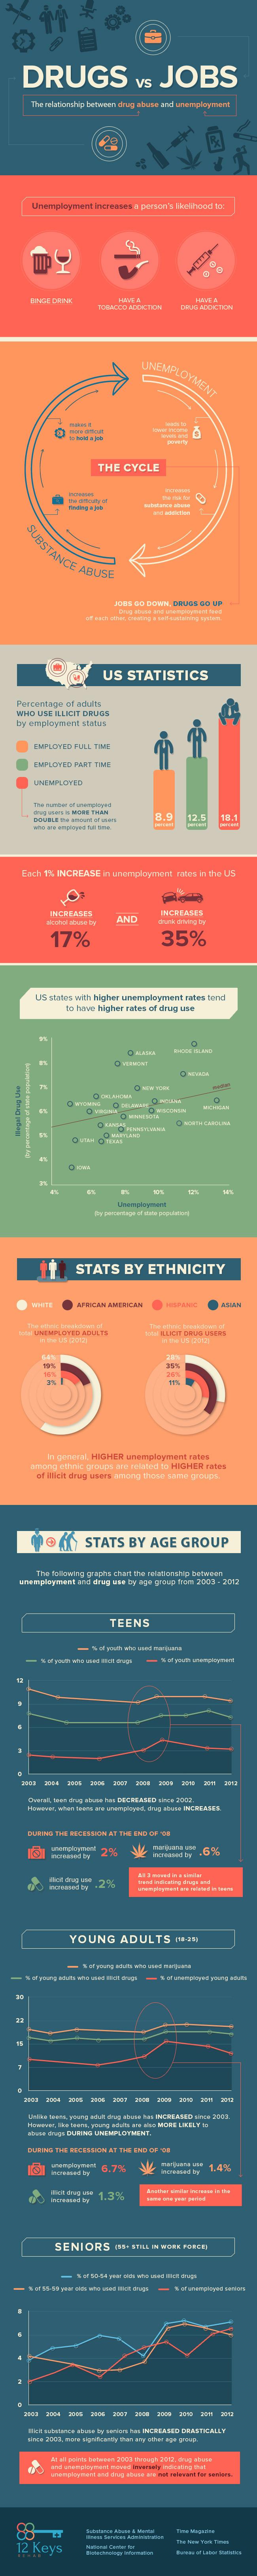 Drugs-vs-Jobs-Infographic